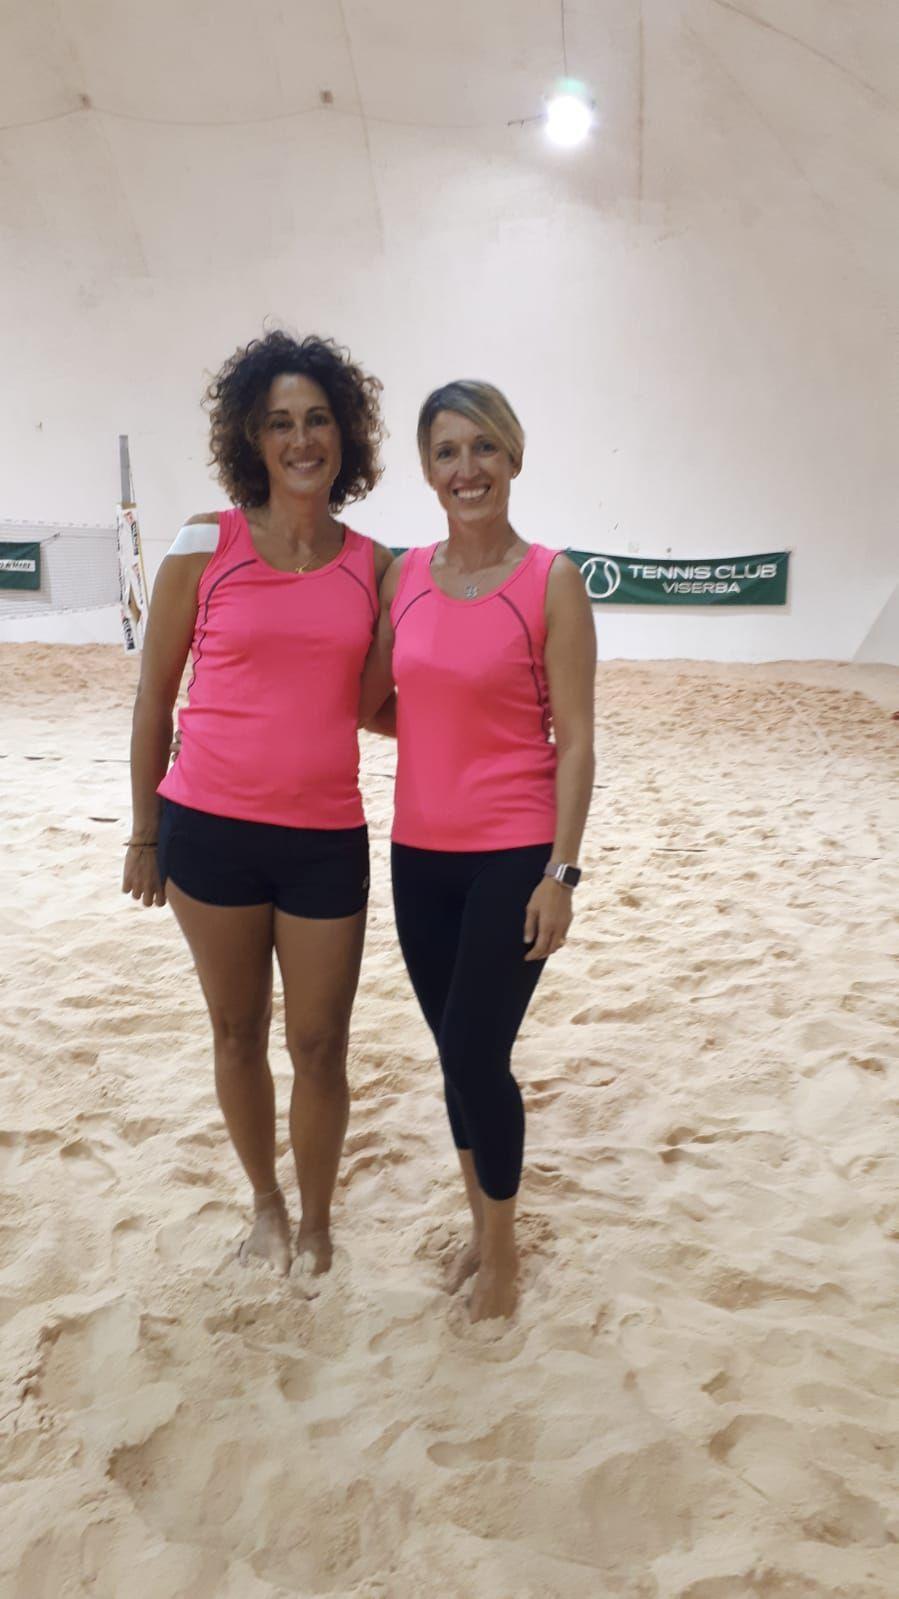 Beach Tennis Viserba: Giovanna Pedrosi e Barbara Galassi